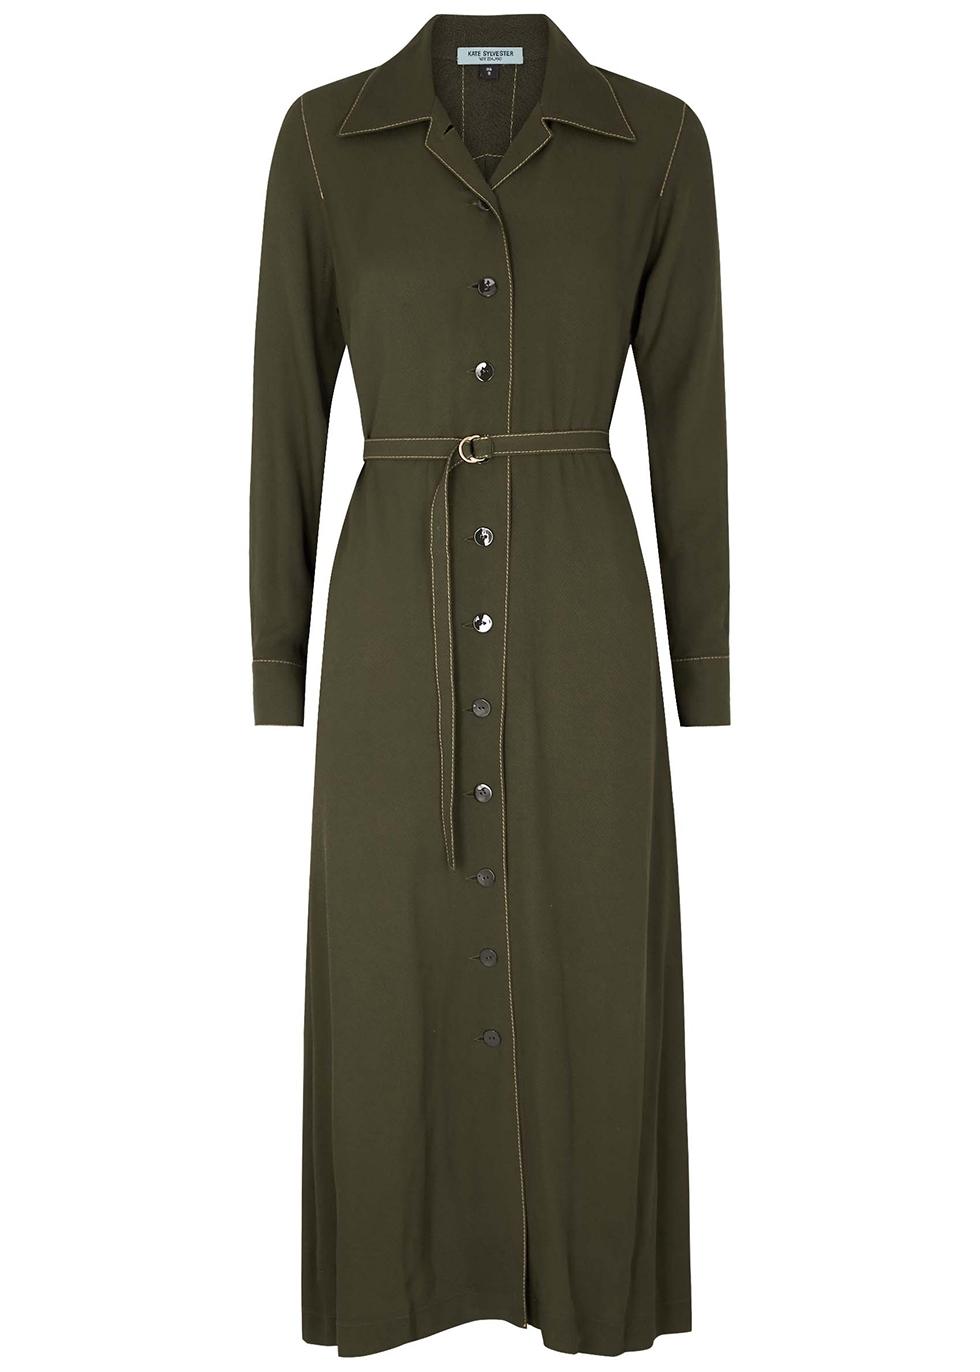 Marion olive twill shirt dress